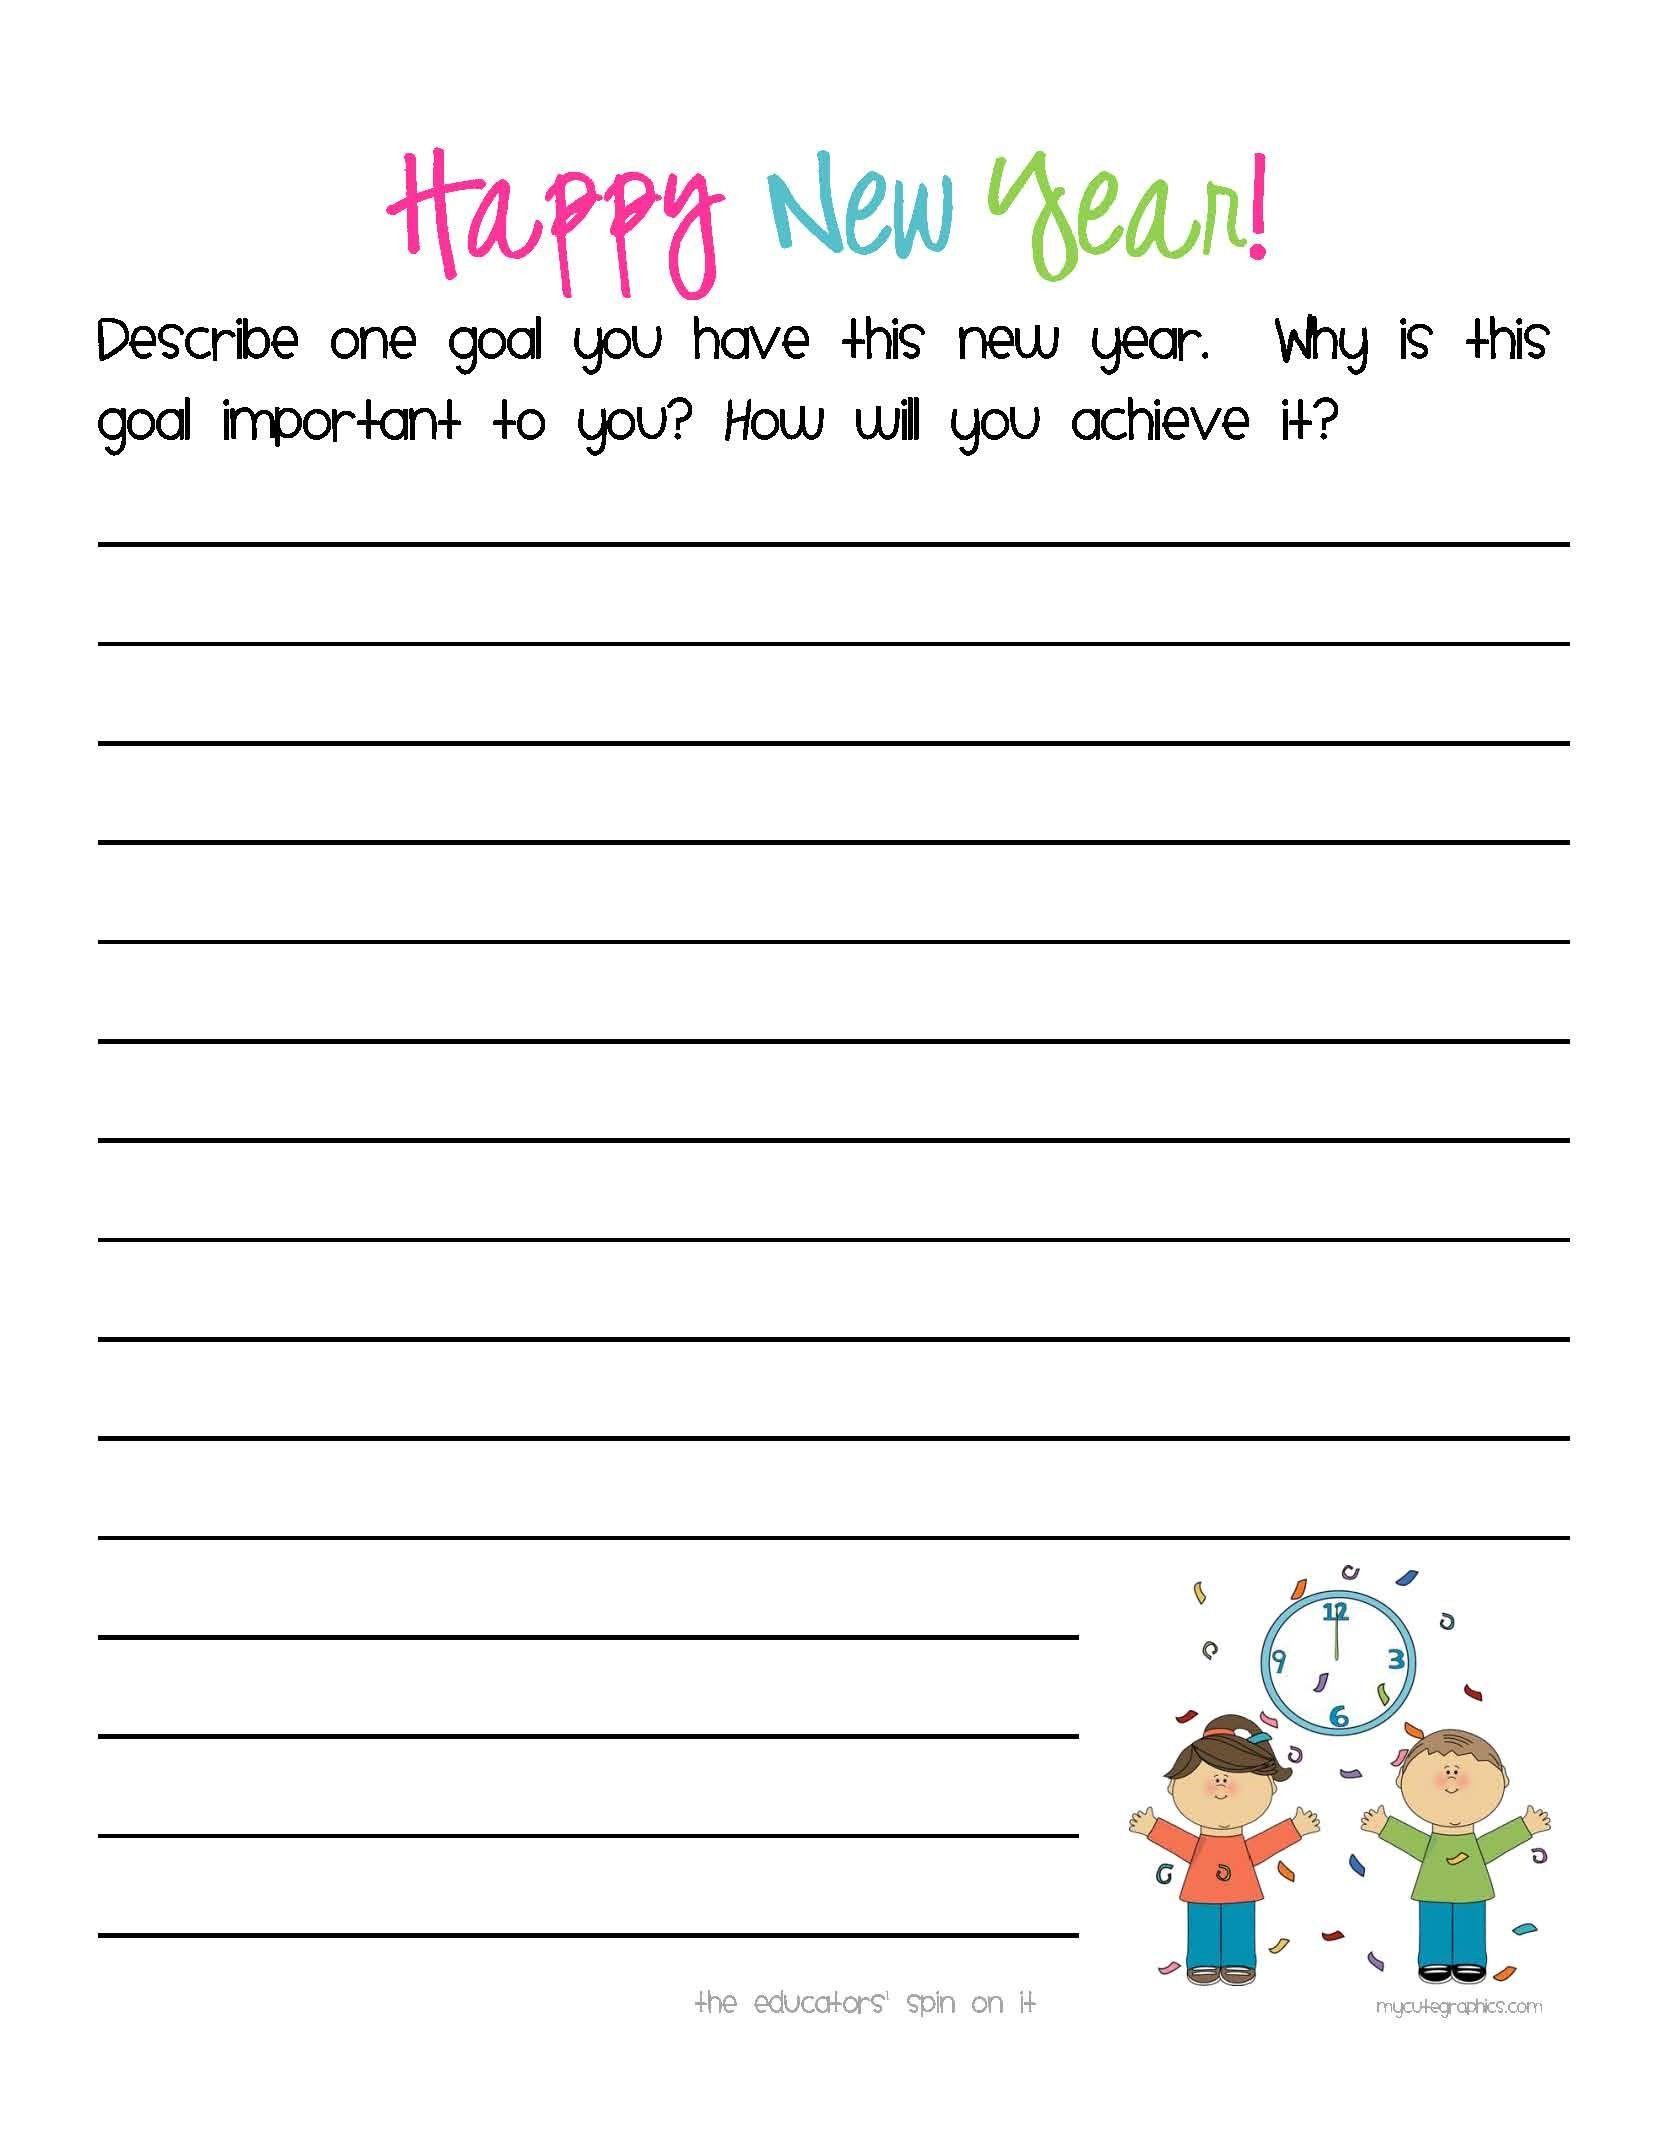 4th Grade Essay Writing Worksheets 6 4th Grade Essay Writing Worksheets  Worksheets   Creative writing worksheets [ 2156 x 1667 Pixel ]